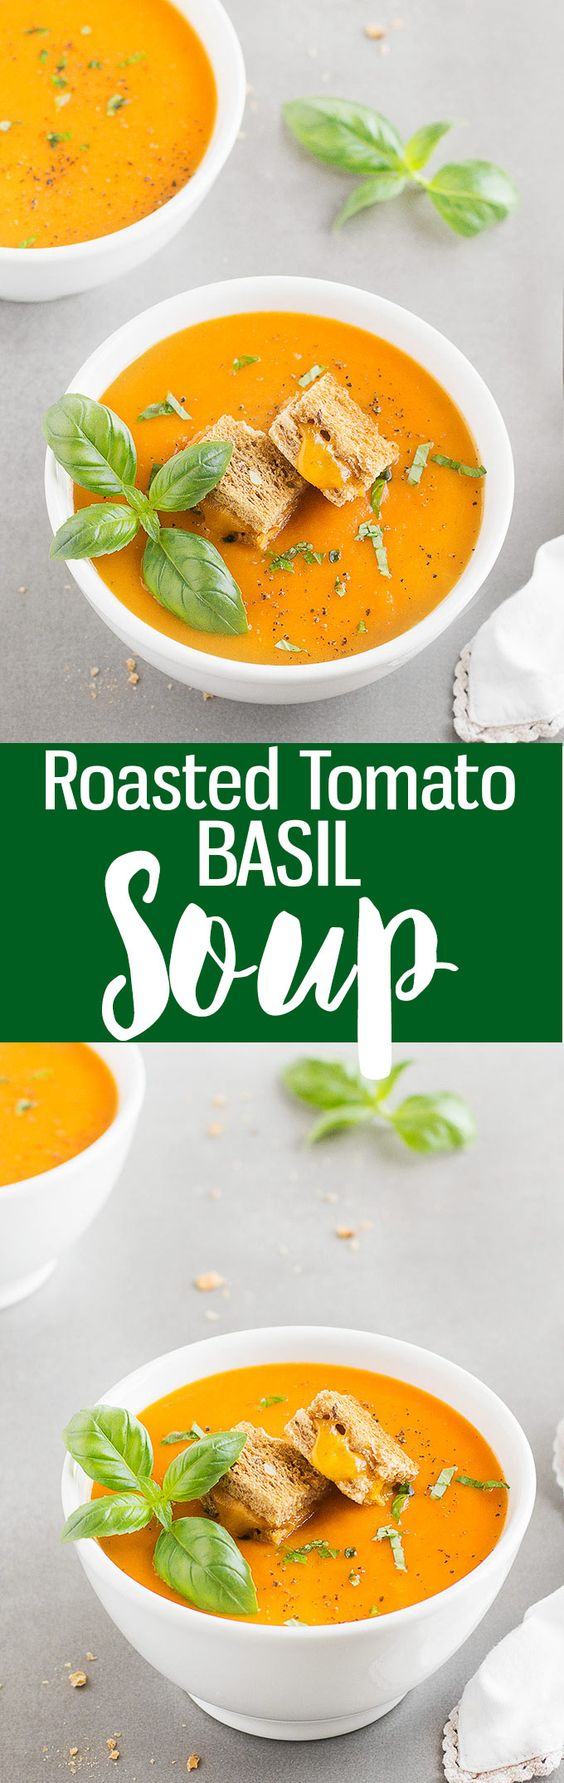 Roasted tomato basil soup, Tomato basil soup and Roasted tomatoes on ...